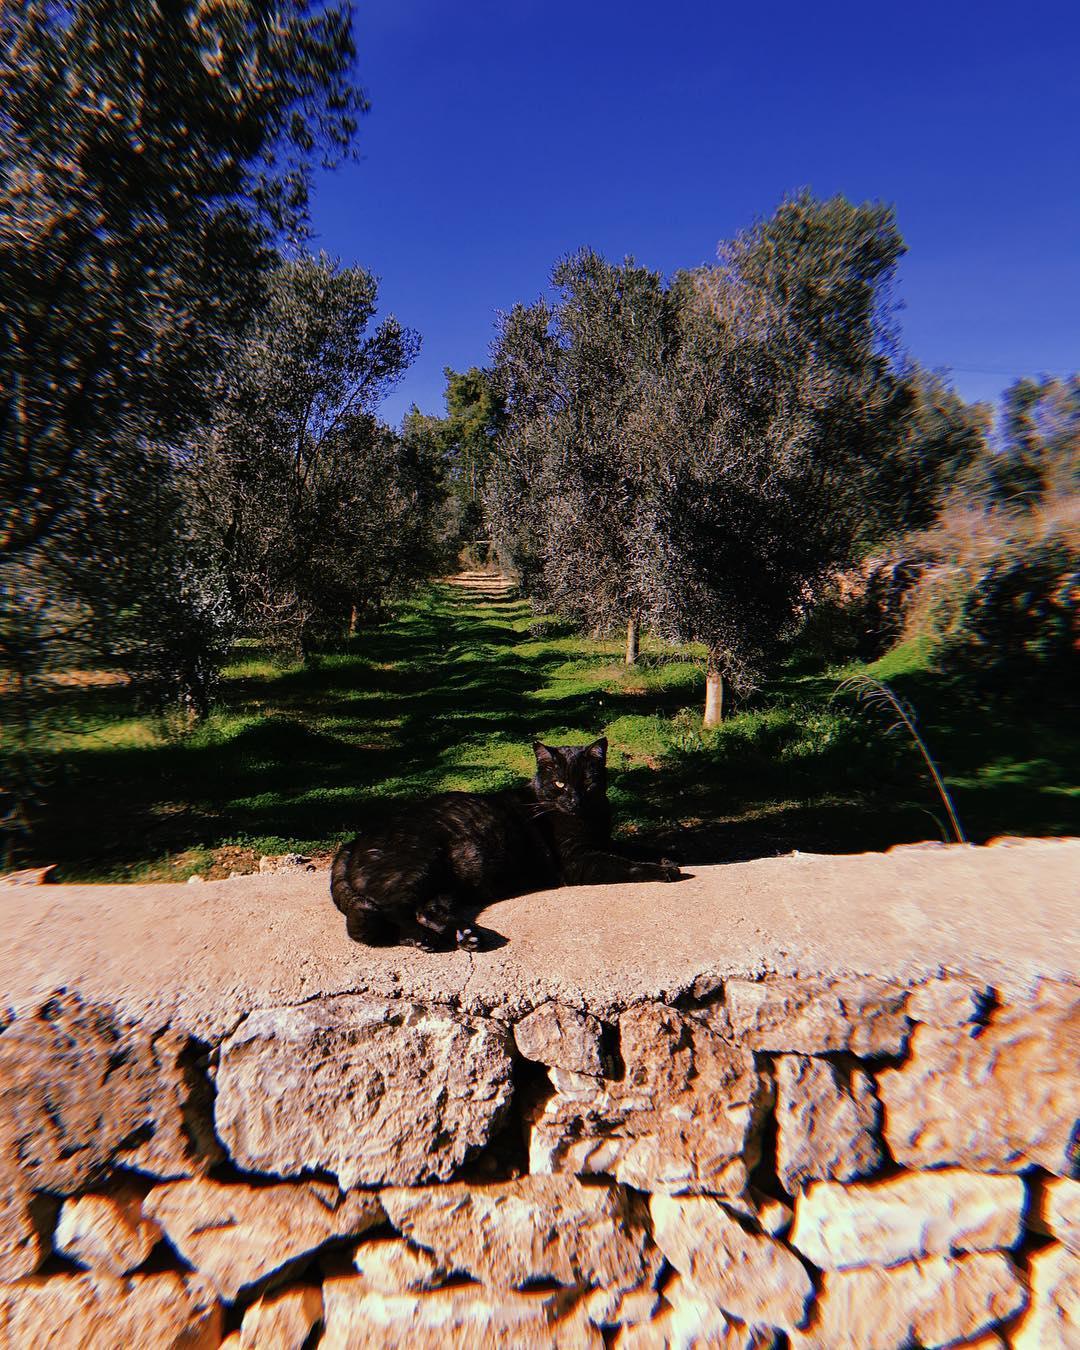    Bathing in the December sun    #ninothehousecat #blackcat #mascota #sunbathing #goodlife #december #olivegrove #olivetrees #bluesky #mediterranean #garden #lascicadasibiza #finca #rustic #farmhouse #campo #nature #ibiza #winterseason